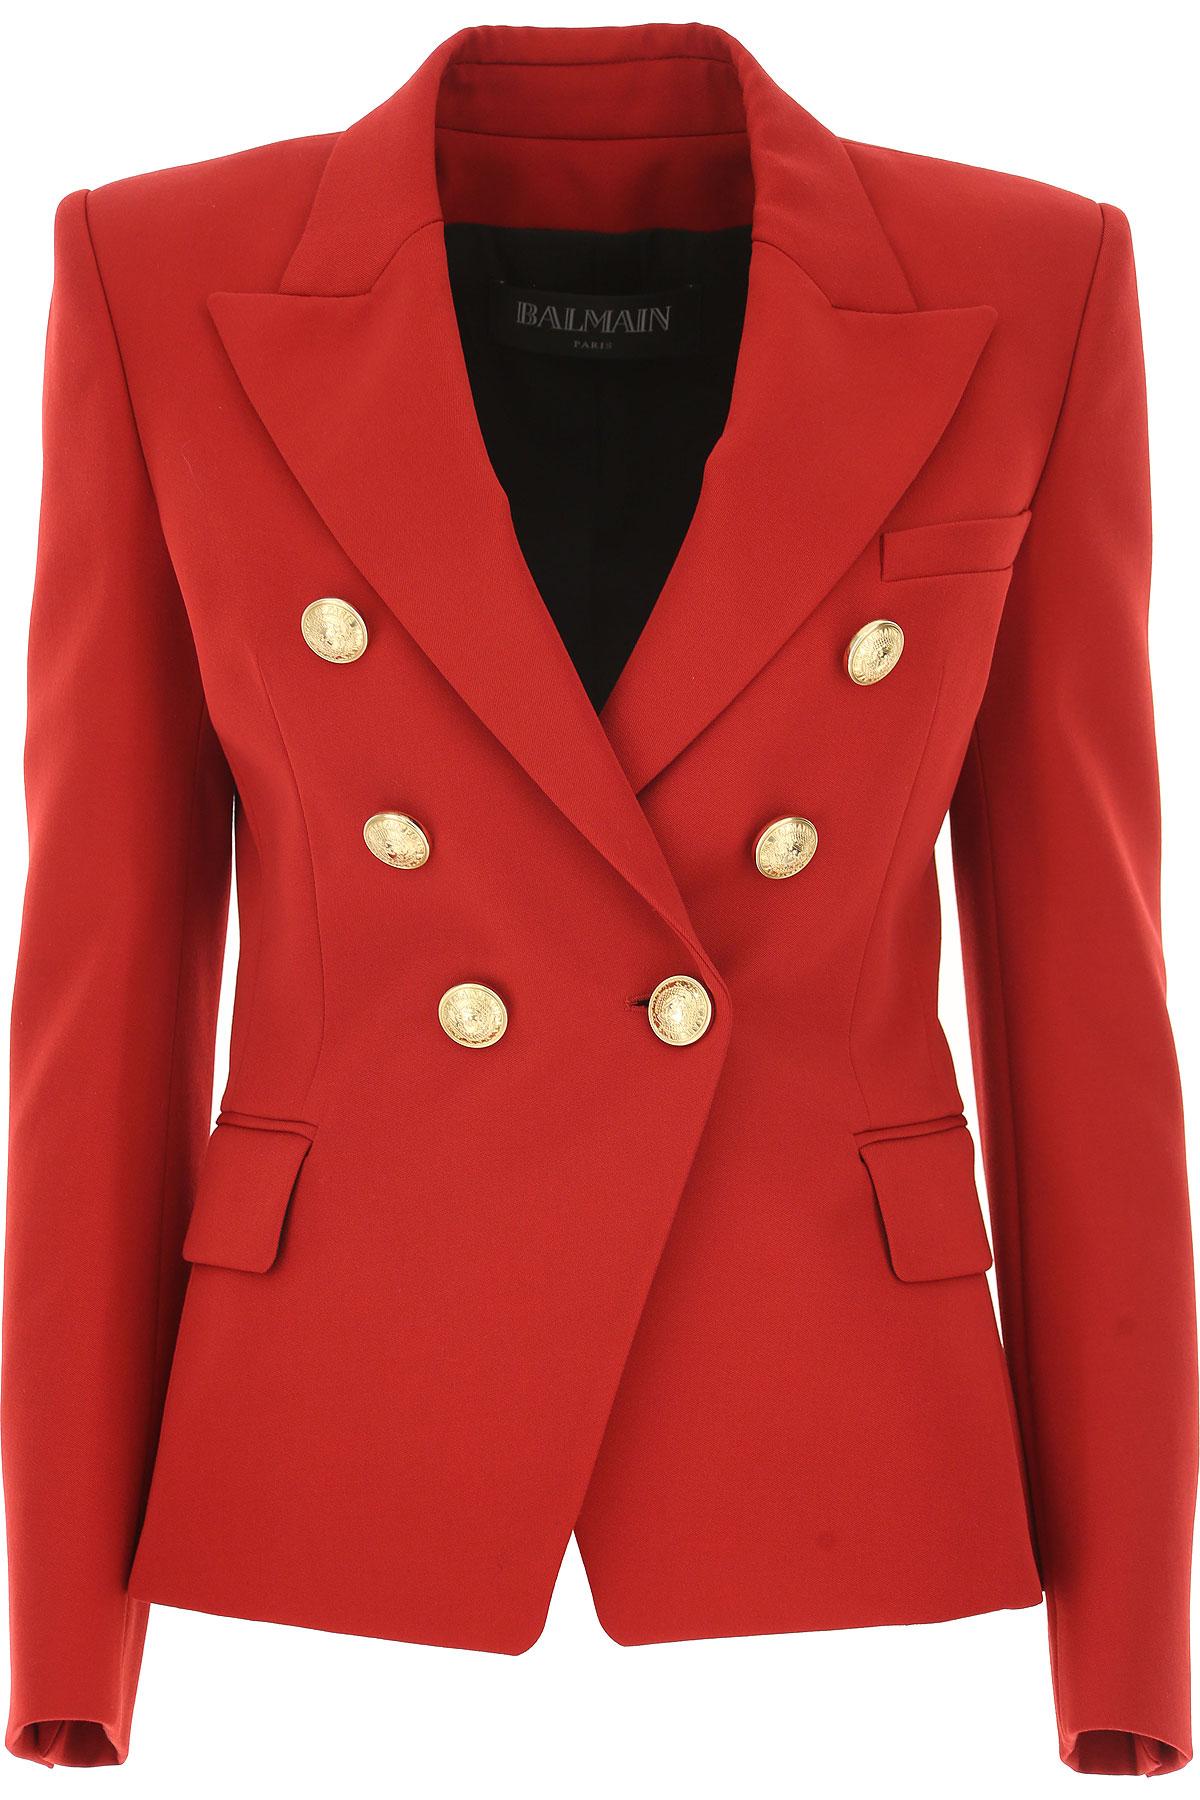 Image of Balmain Blazer for Women, Red, Wool, 2017, 2